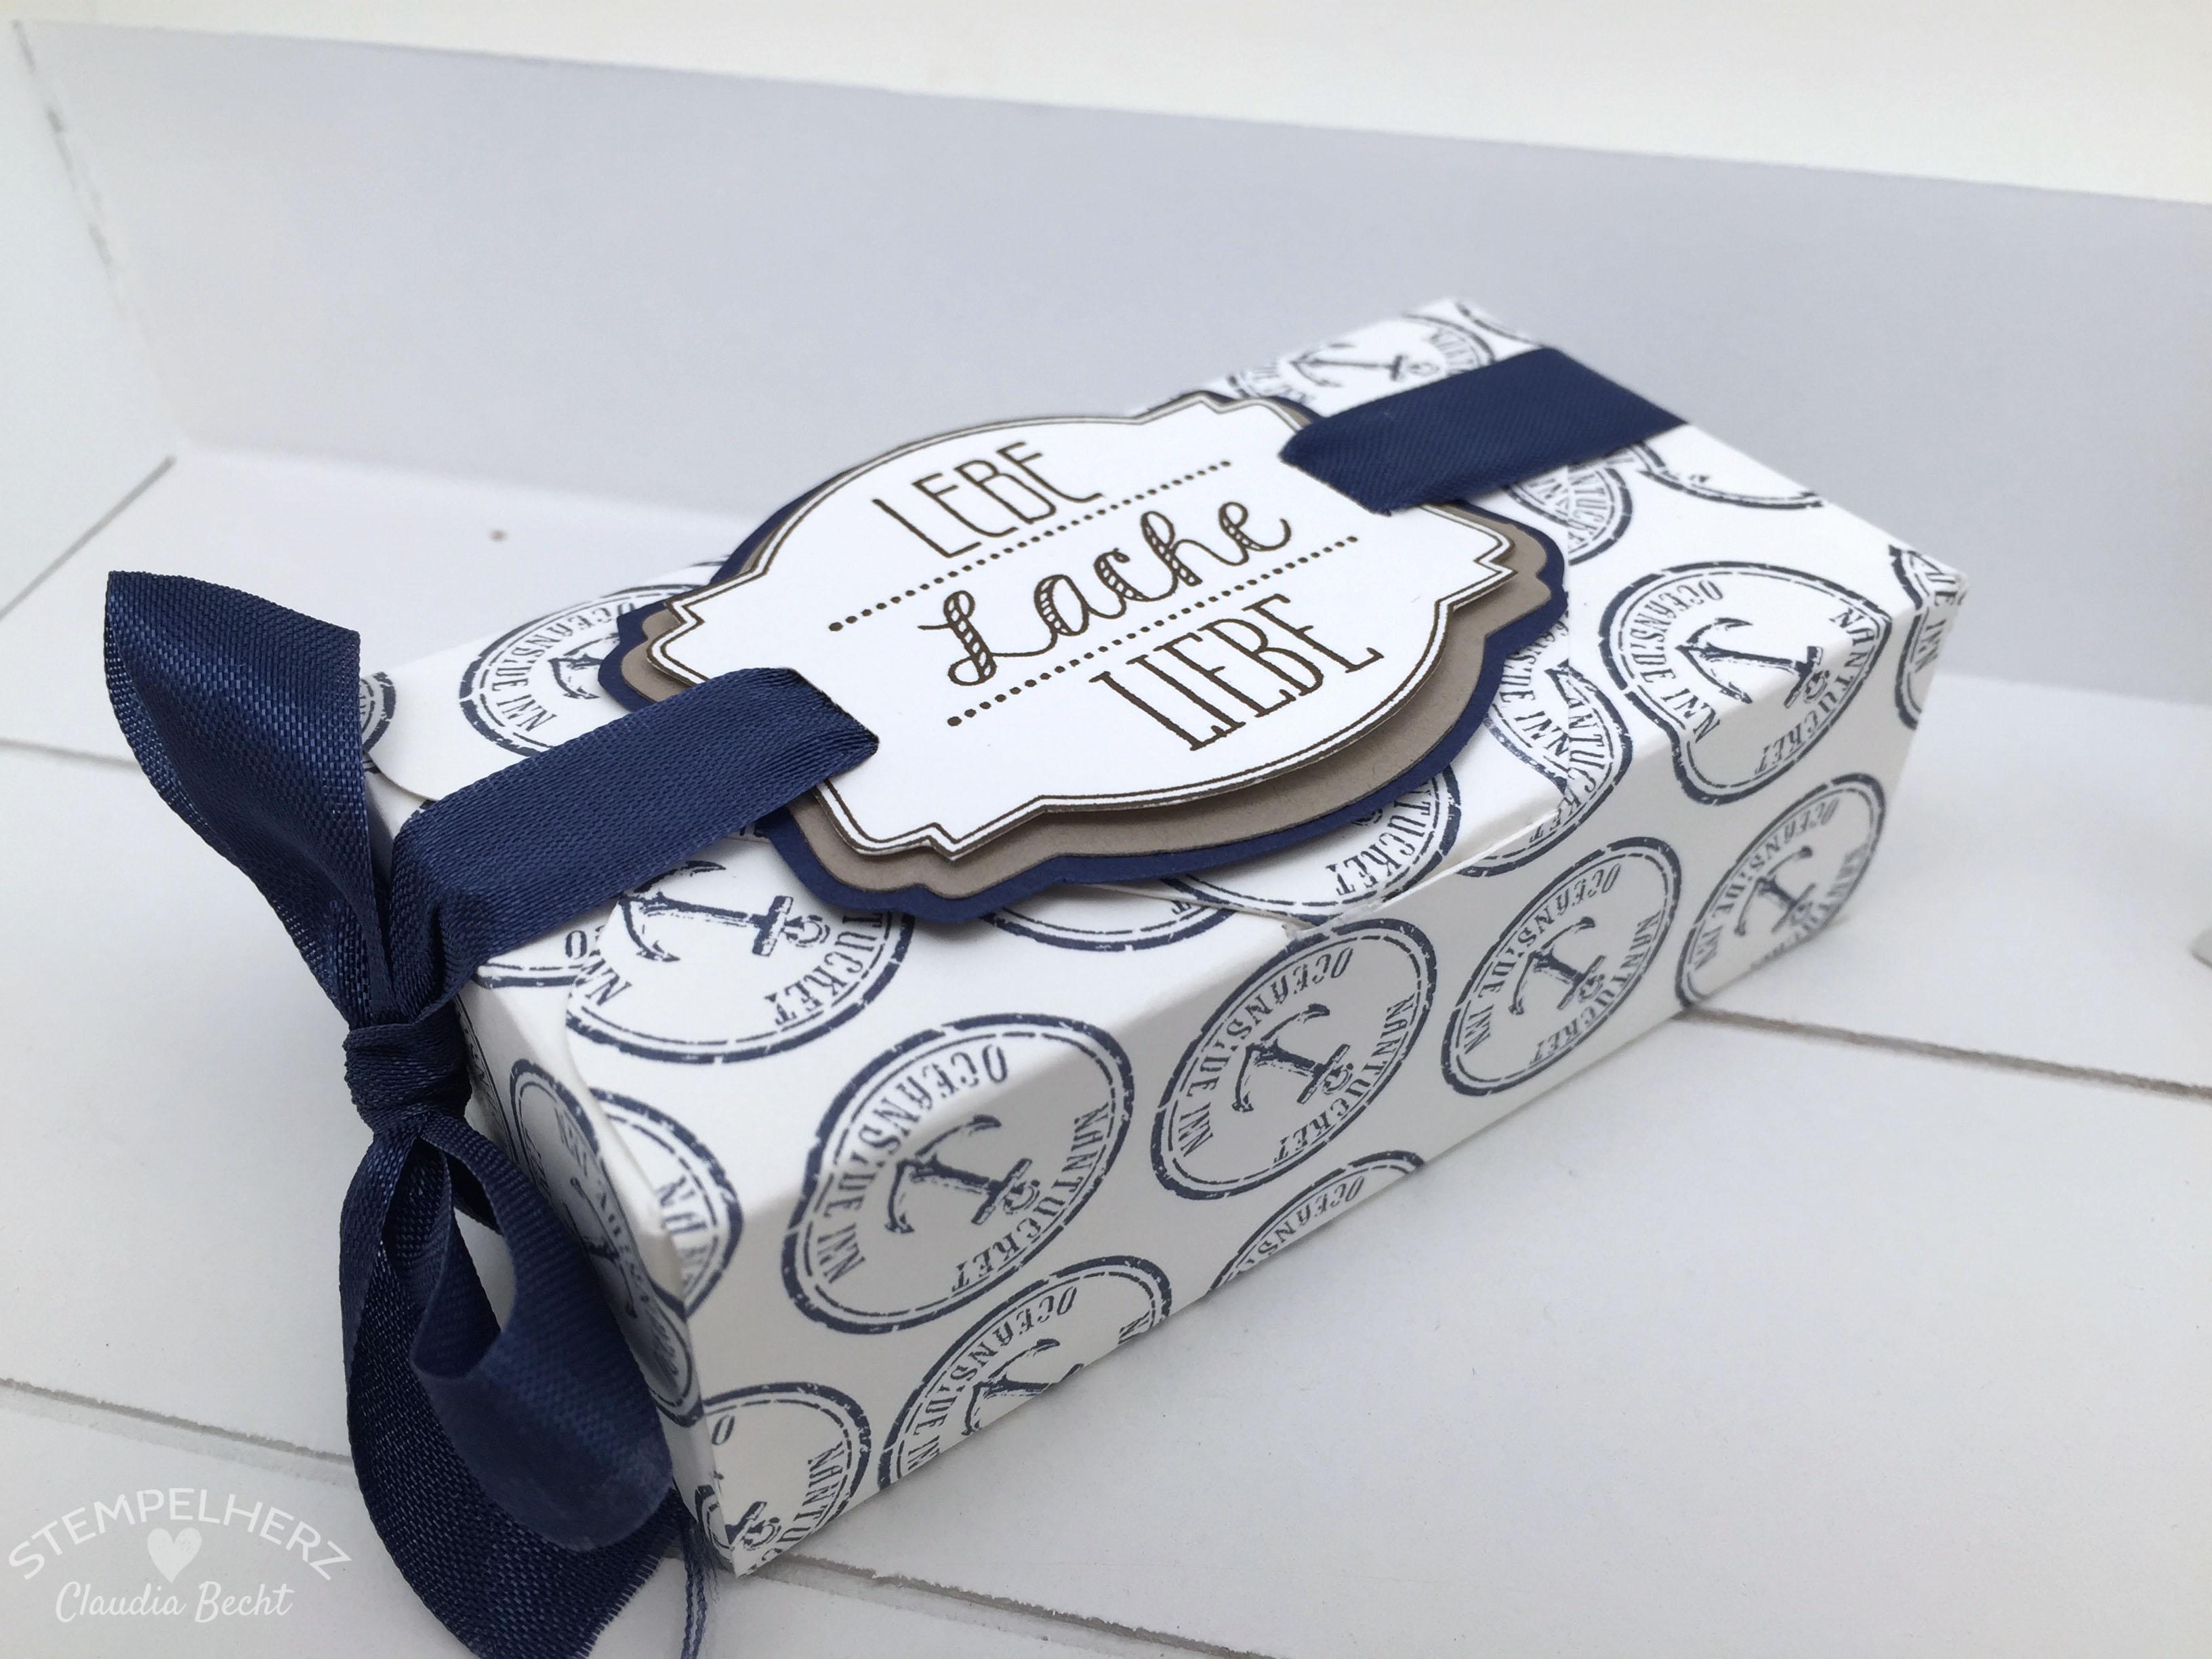 Stampin Up-Stempelherz-Boxen-Verpackung-Ach du meine Gruesse-By the Tide-Verpackung Lebe Lache Liebe 05